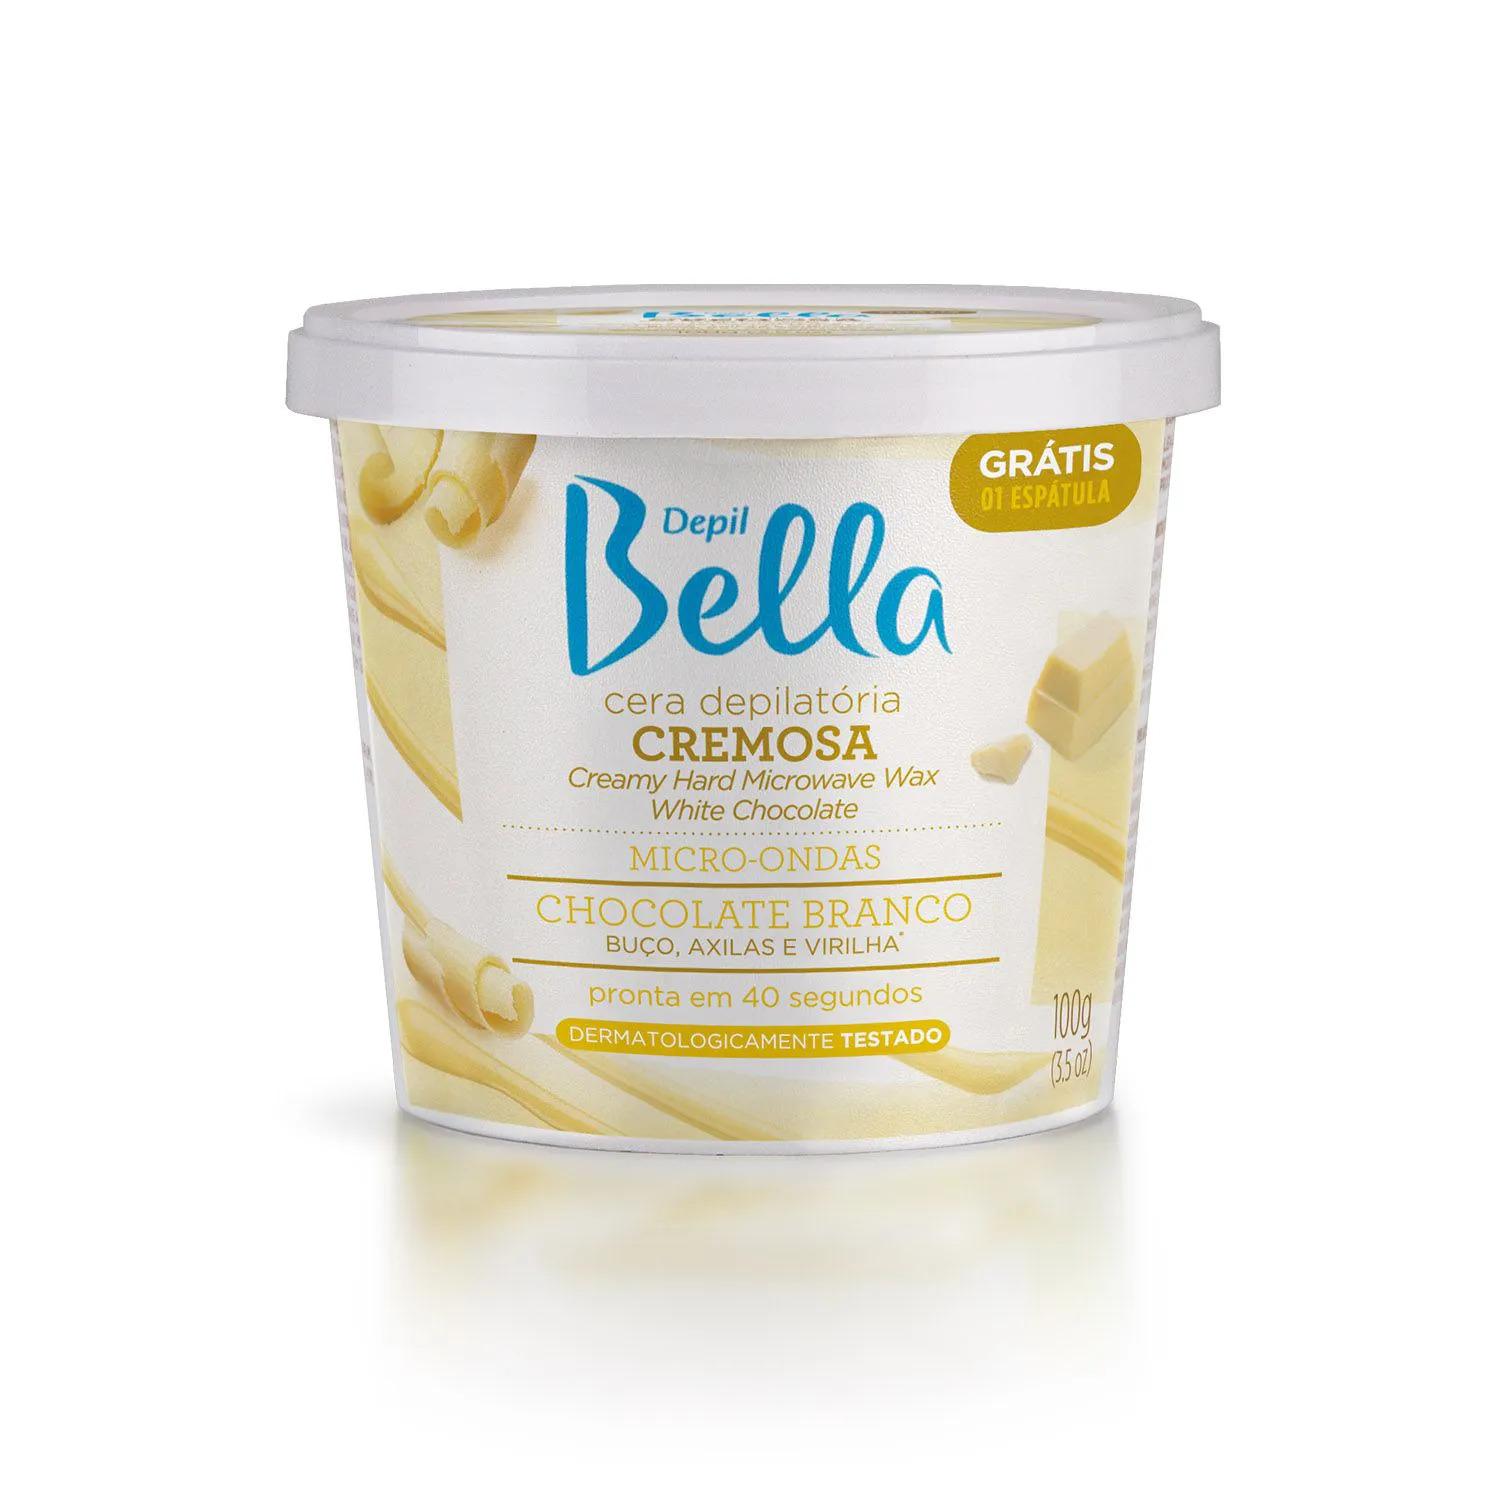 Cera Depilatória Cremosa Micro-Ondas Chocolate Branco 100g Depil Bella